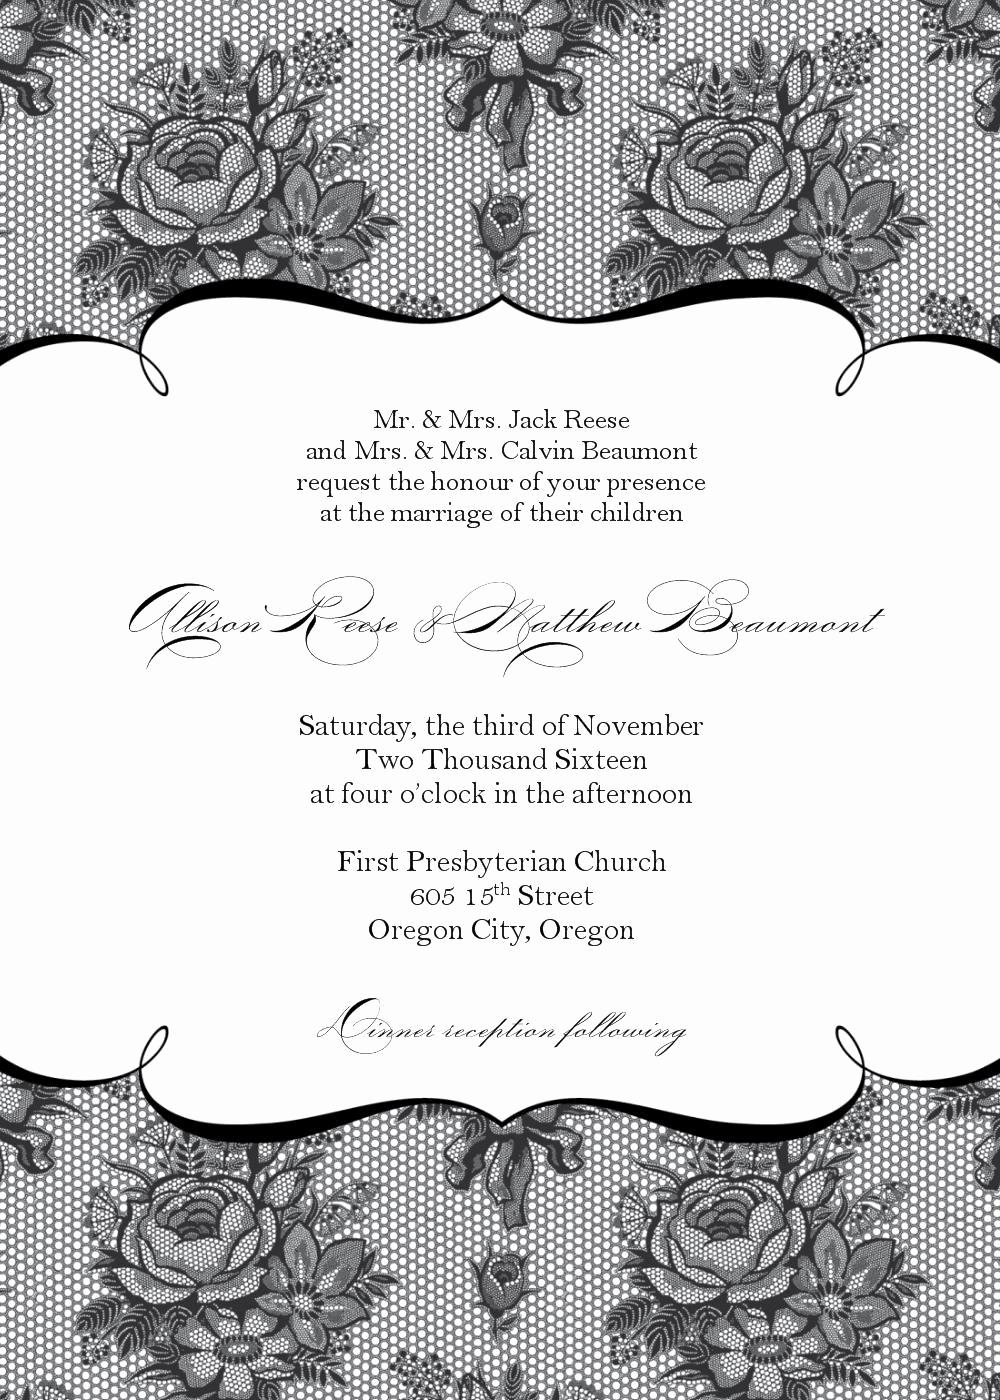 Blank Wedding Invitation Templates Fresh Blank Wedding Invitations Templates